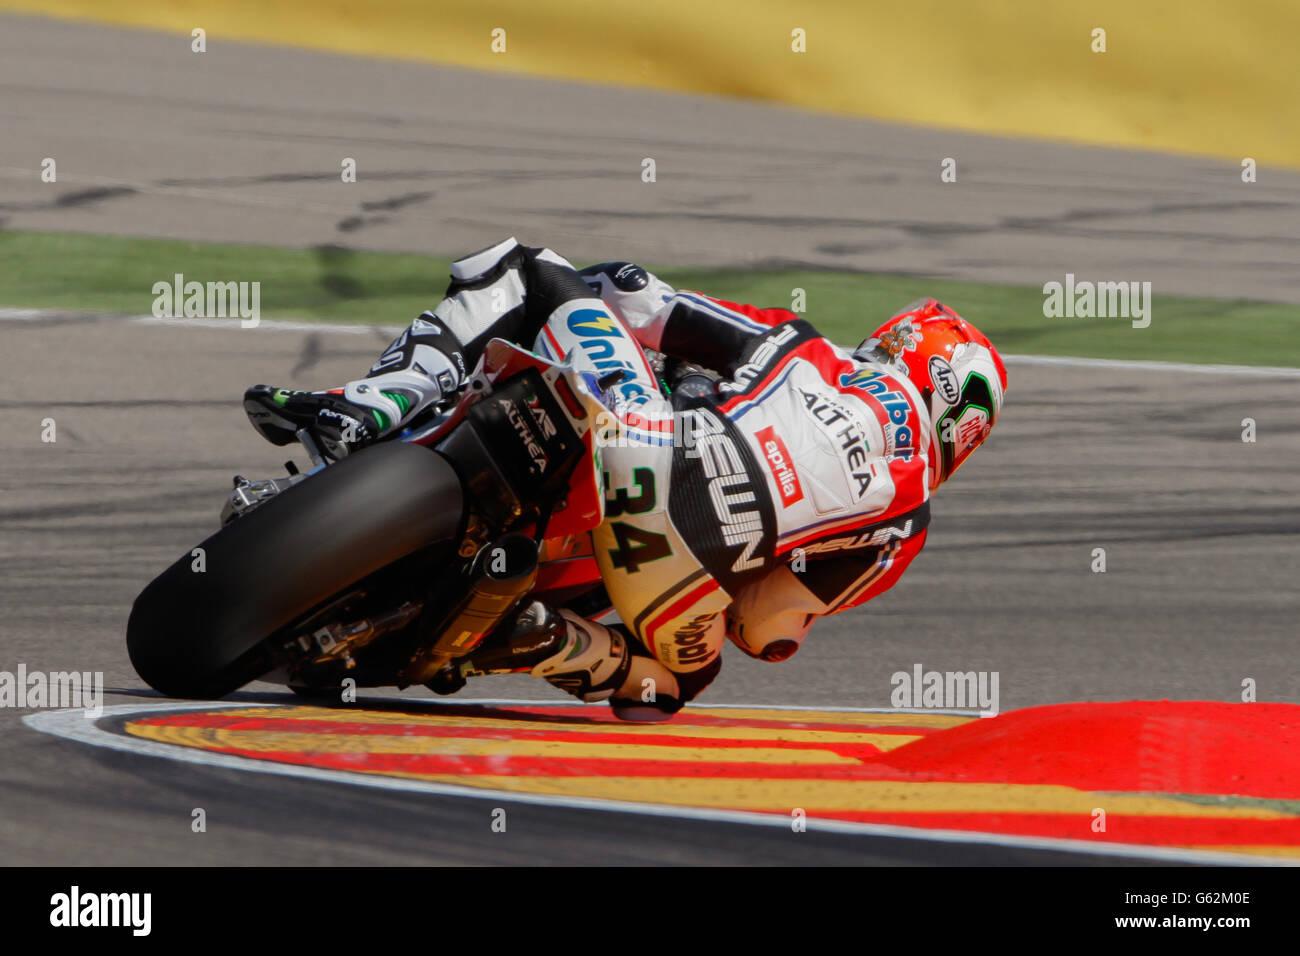 Moto Racing - SuperBike World Championship - Aragon Stock Photo